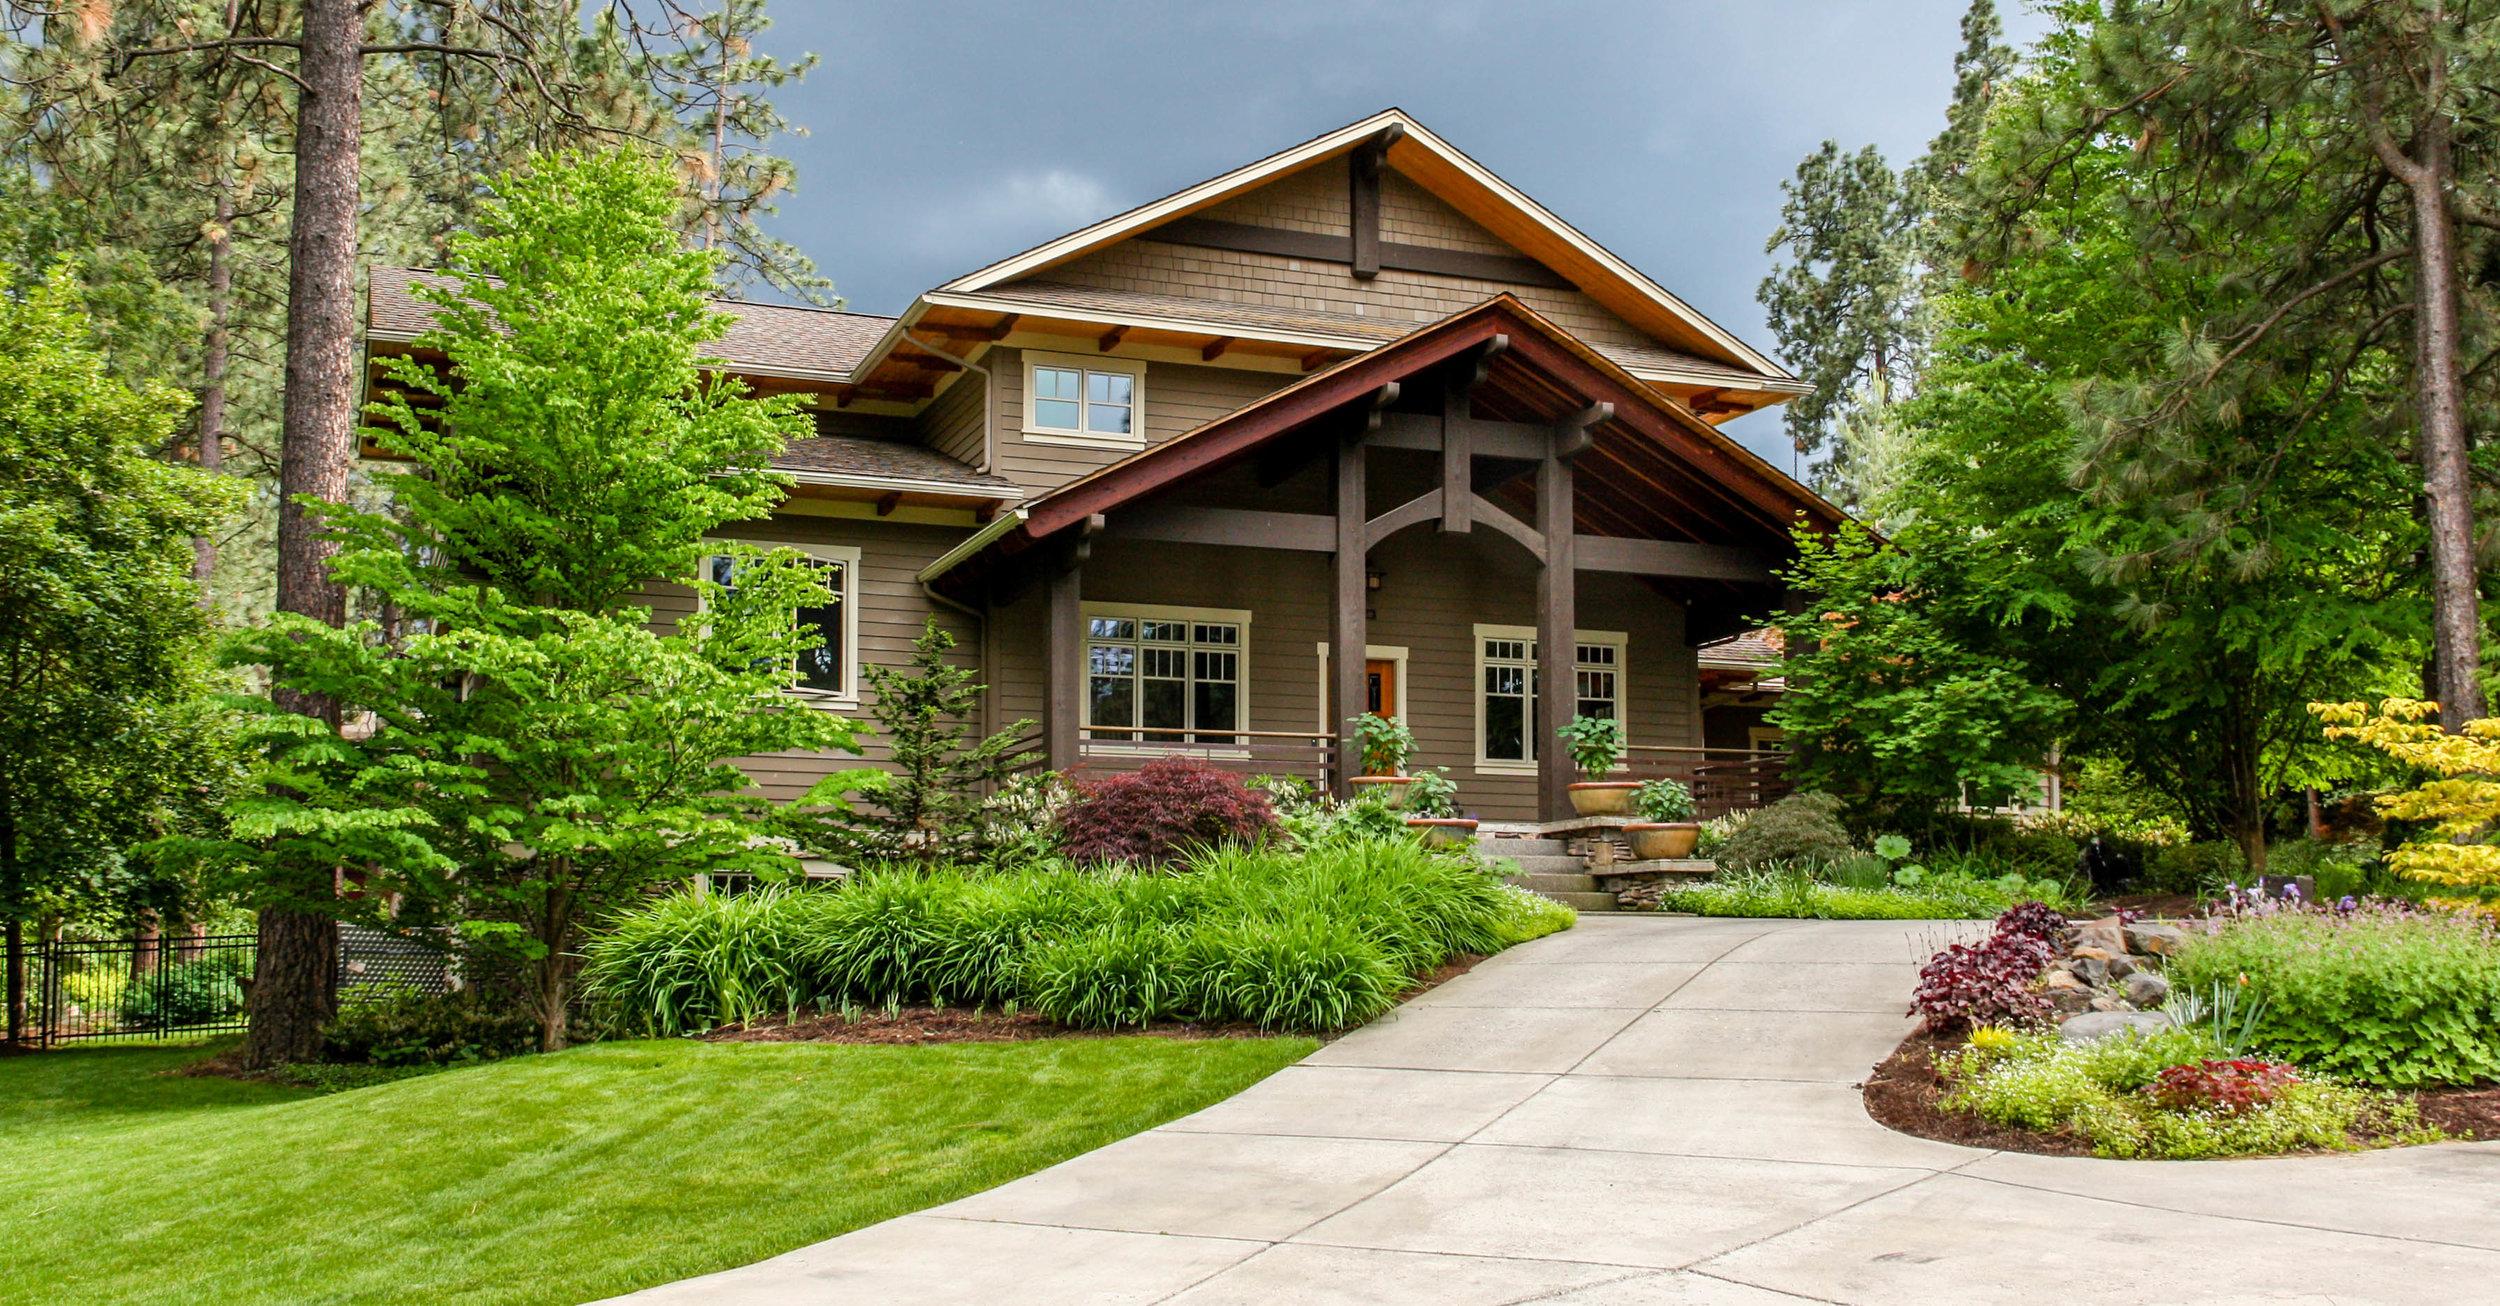 spokane south hill rockwood craftsman landscaping